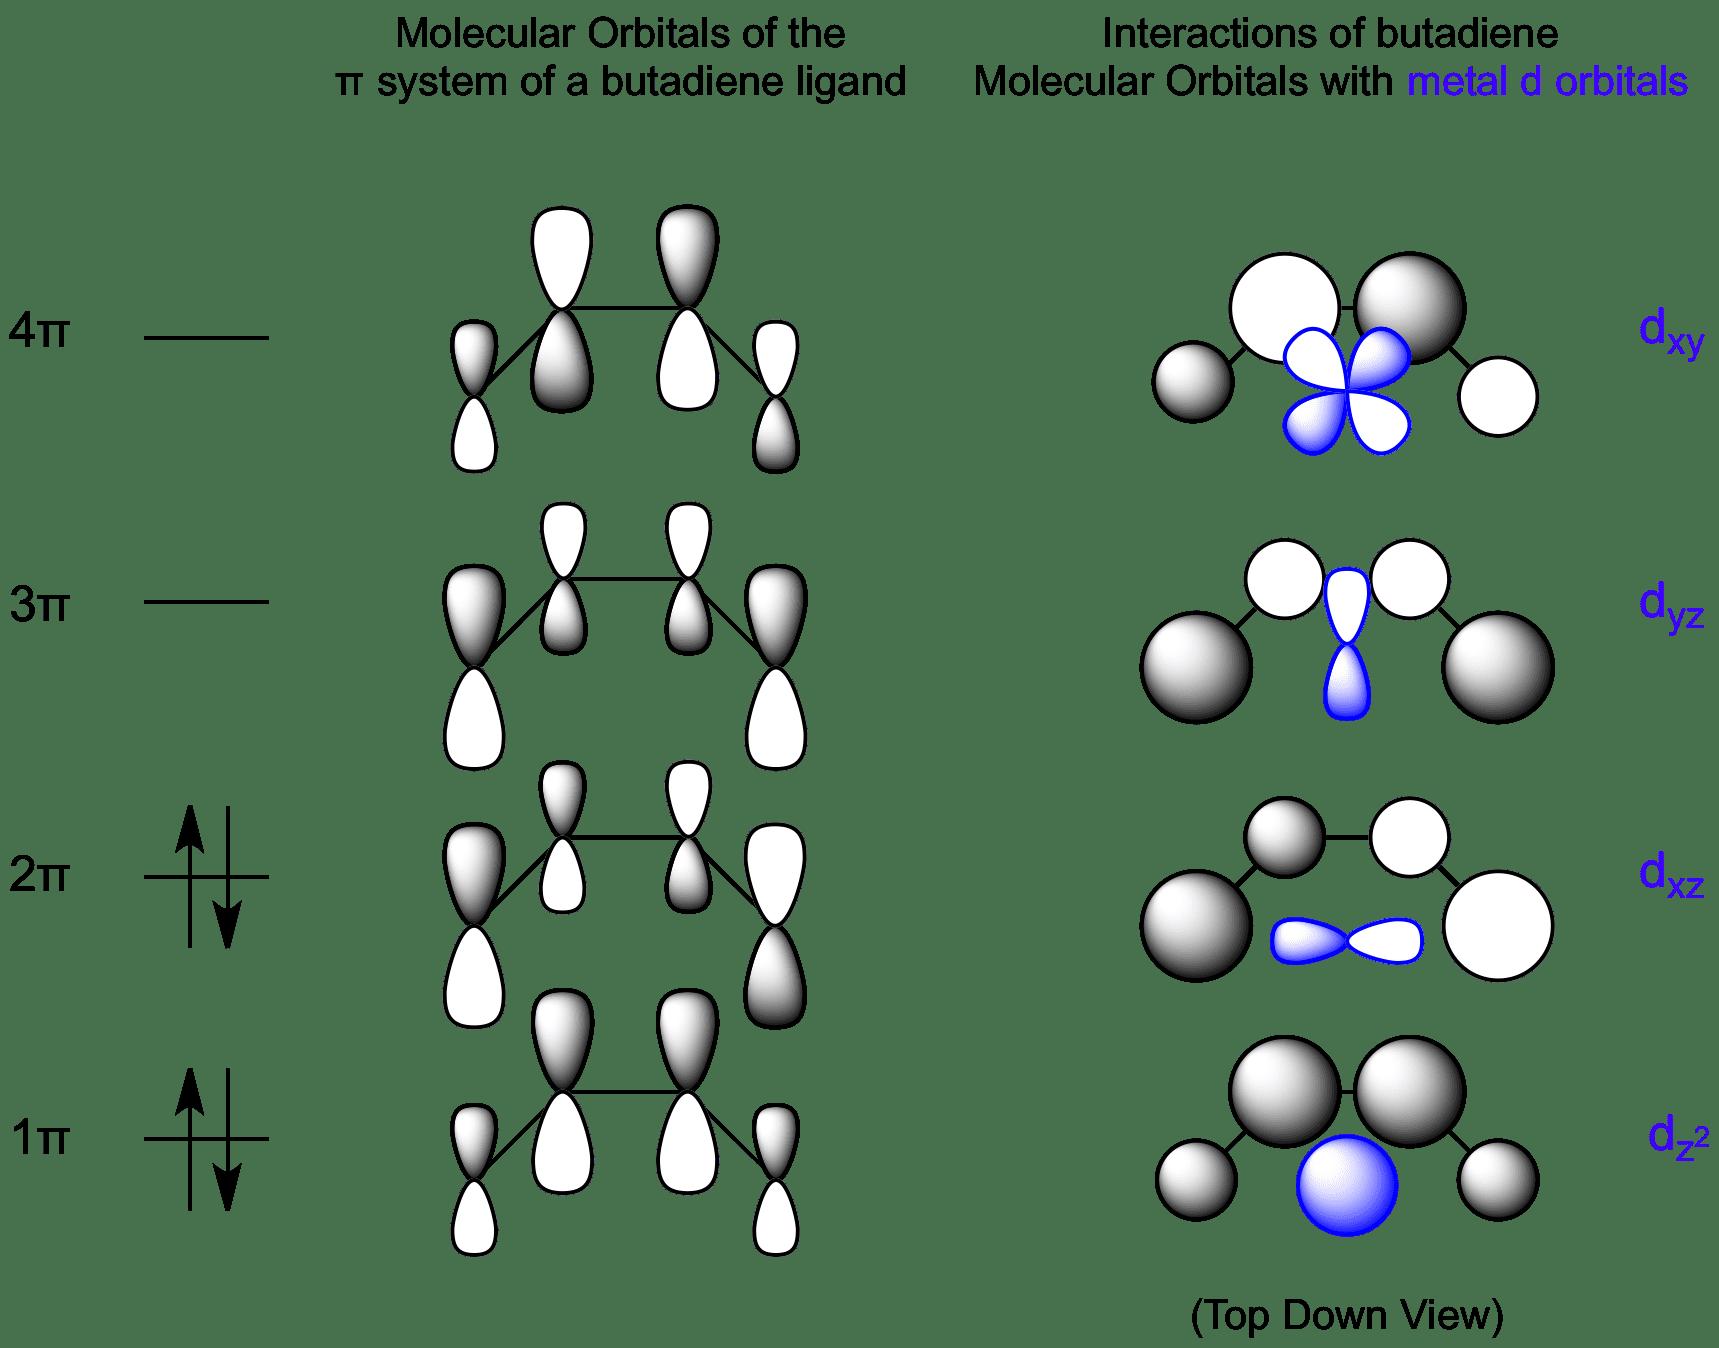 Ethene Molecular Orbitals Molecular Orbitals Here